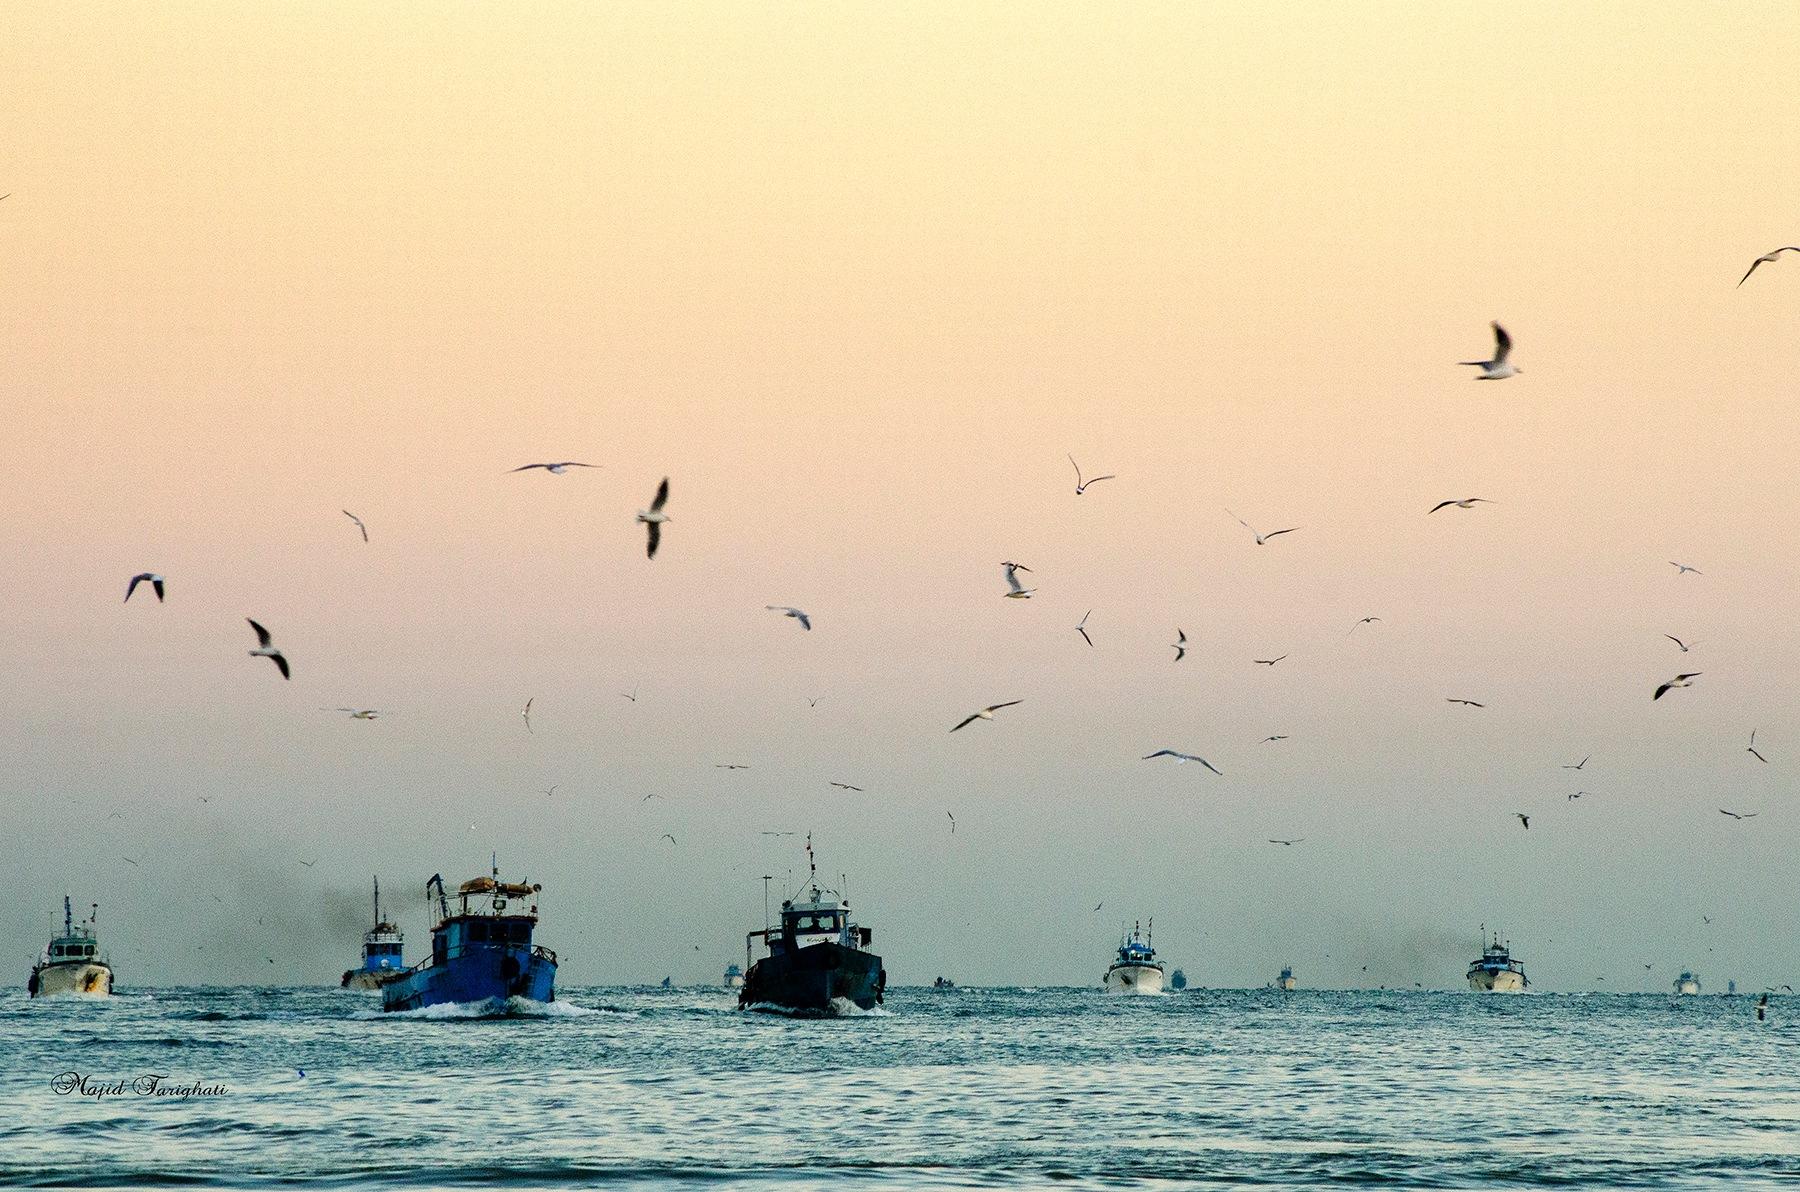 Fishing boat . Babolsar by Majid Tarighati